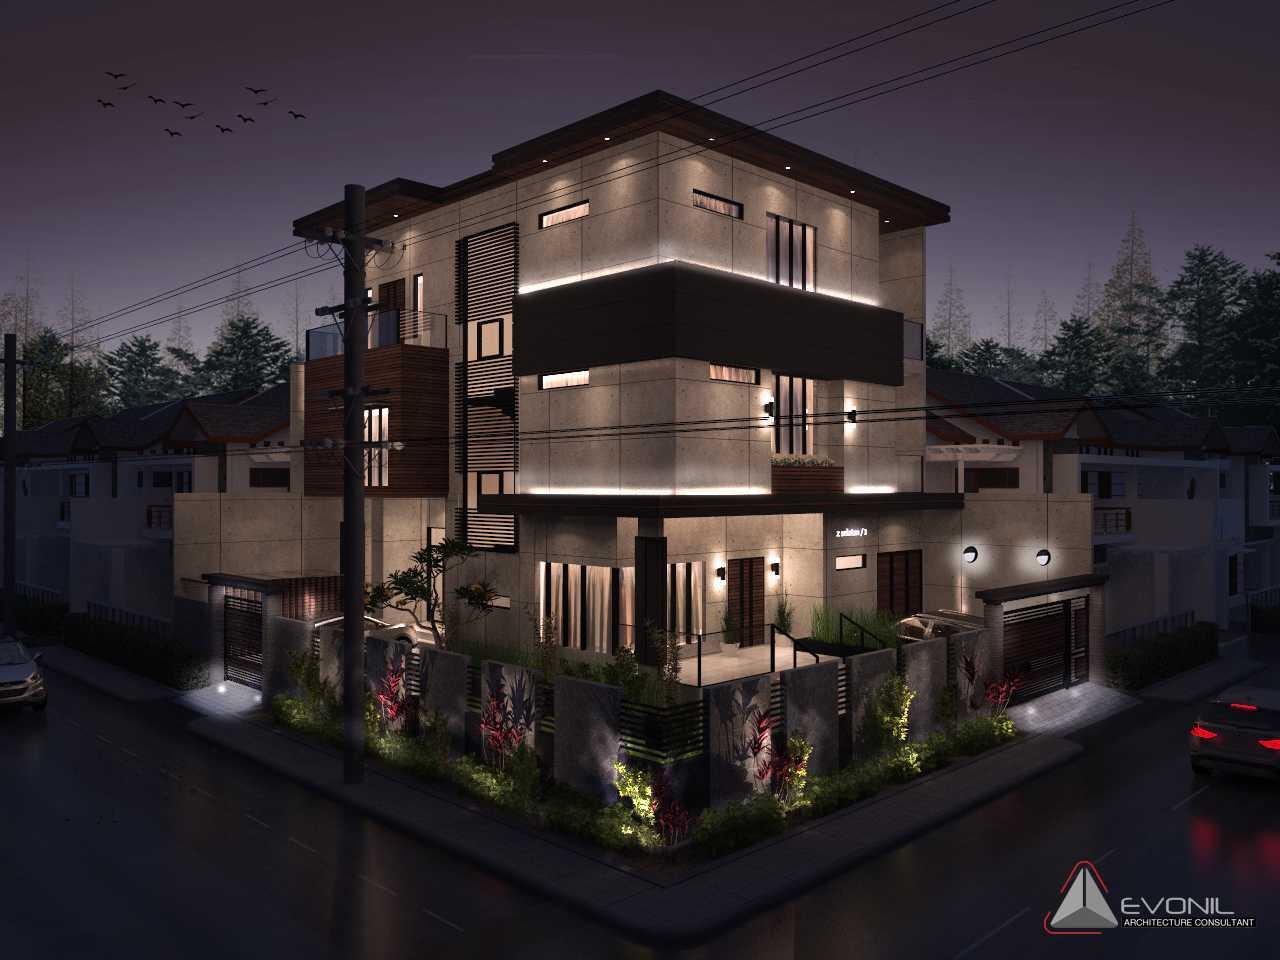 Evonil Architecture Residence Pluit Timur Pluit, Jakarta Pluit, Jakarta Exterior-Night-Lighting-Residence-Pluit-Timur Asian  13027